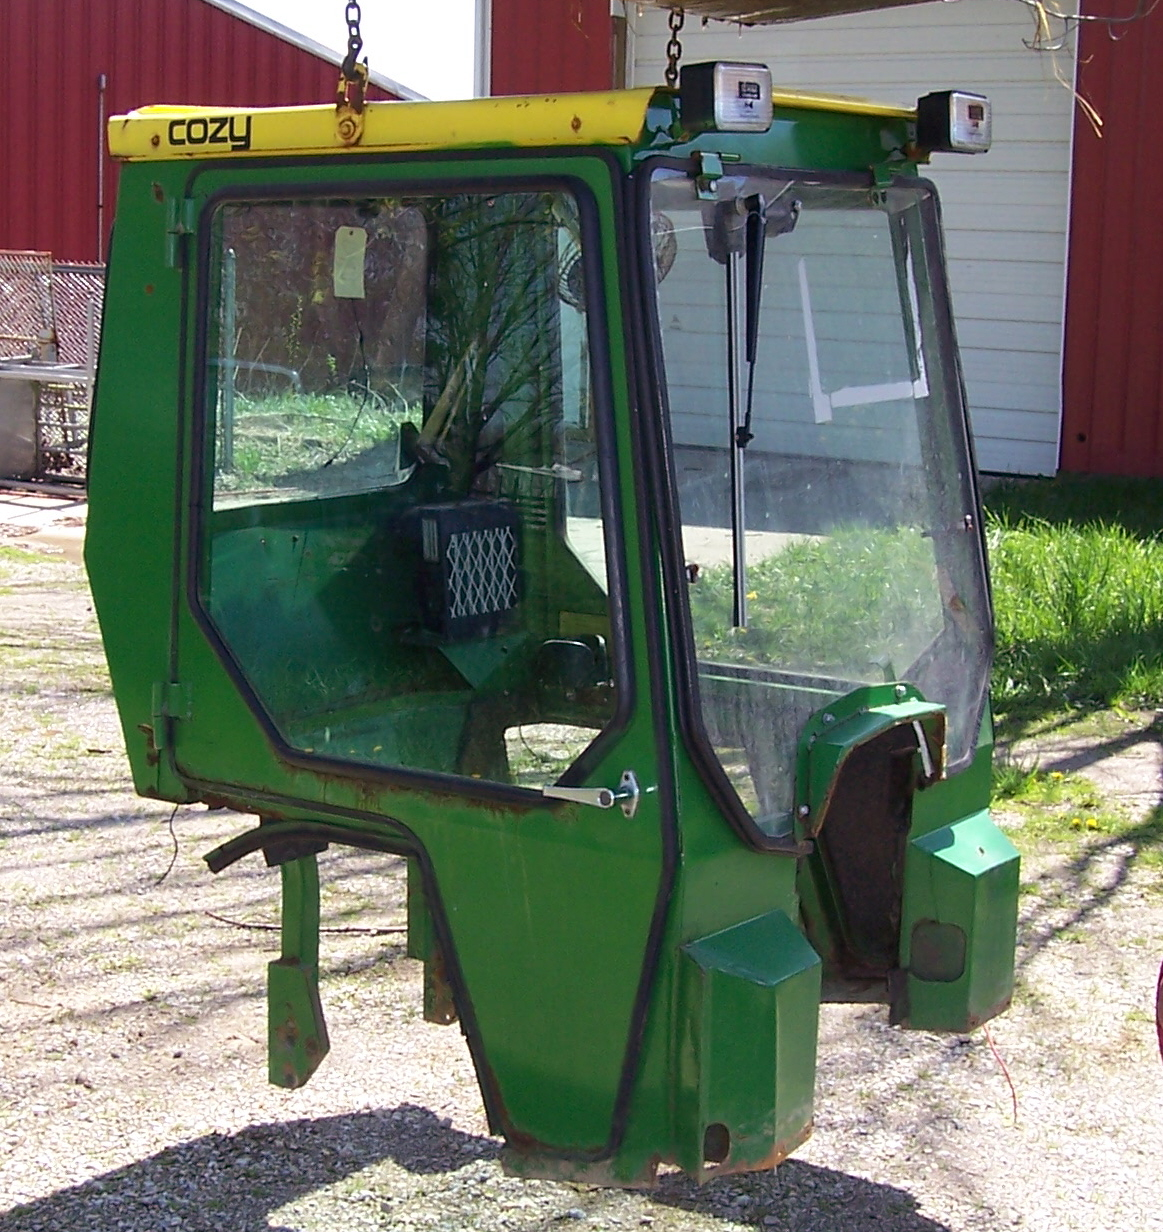 JD 755, 855, 955 Cozy hard side cab for sale